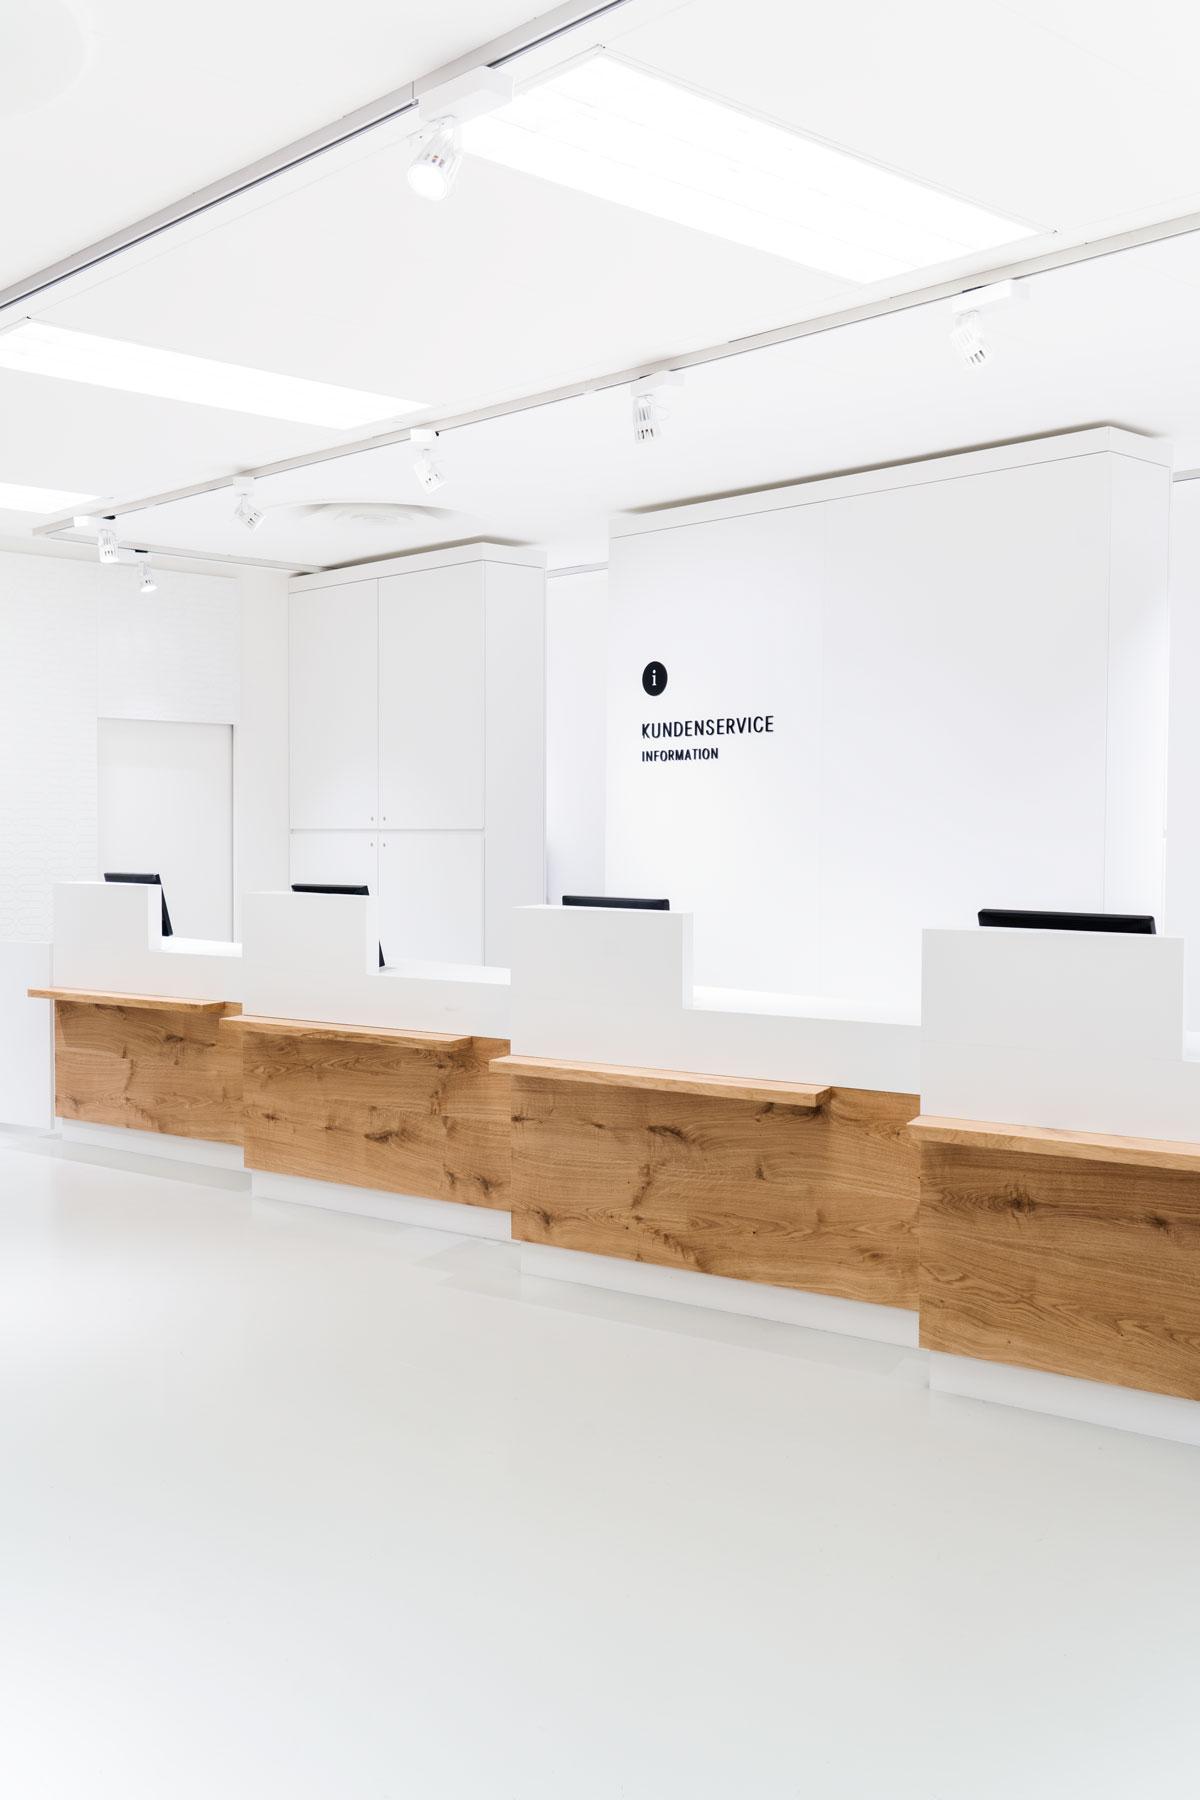 Breuninger Kundenservice, Counter